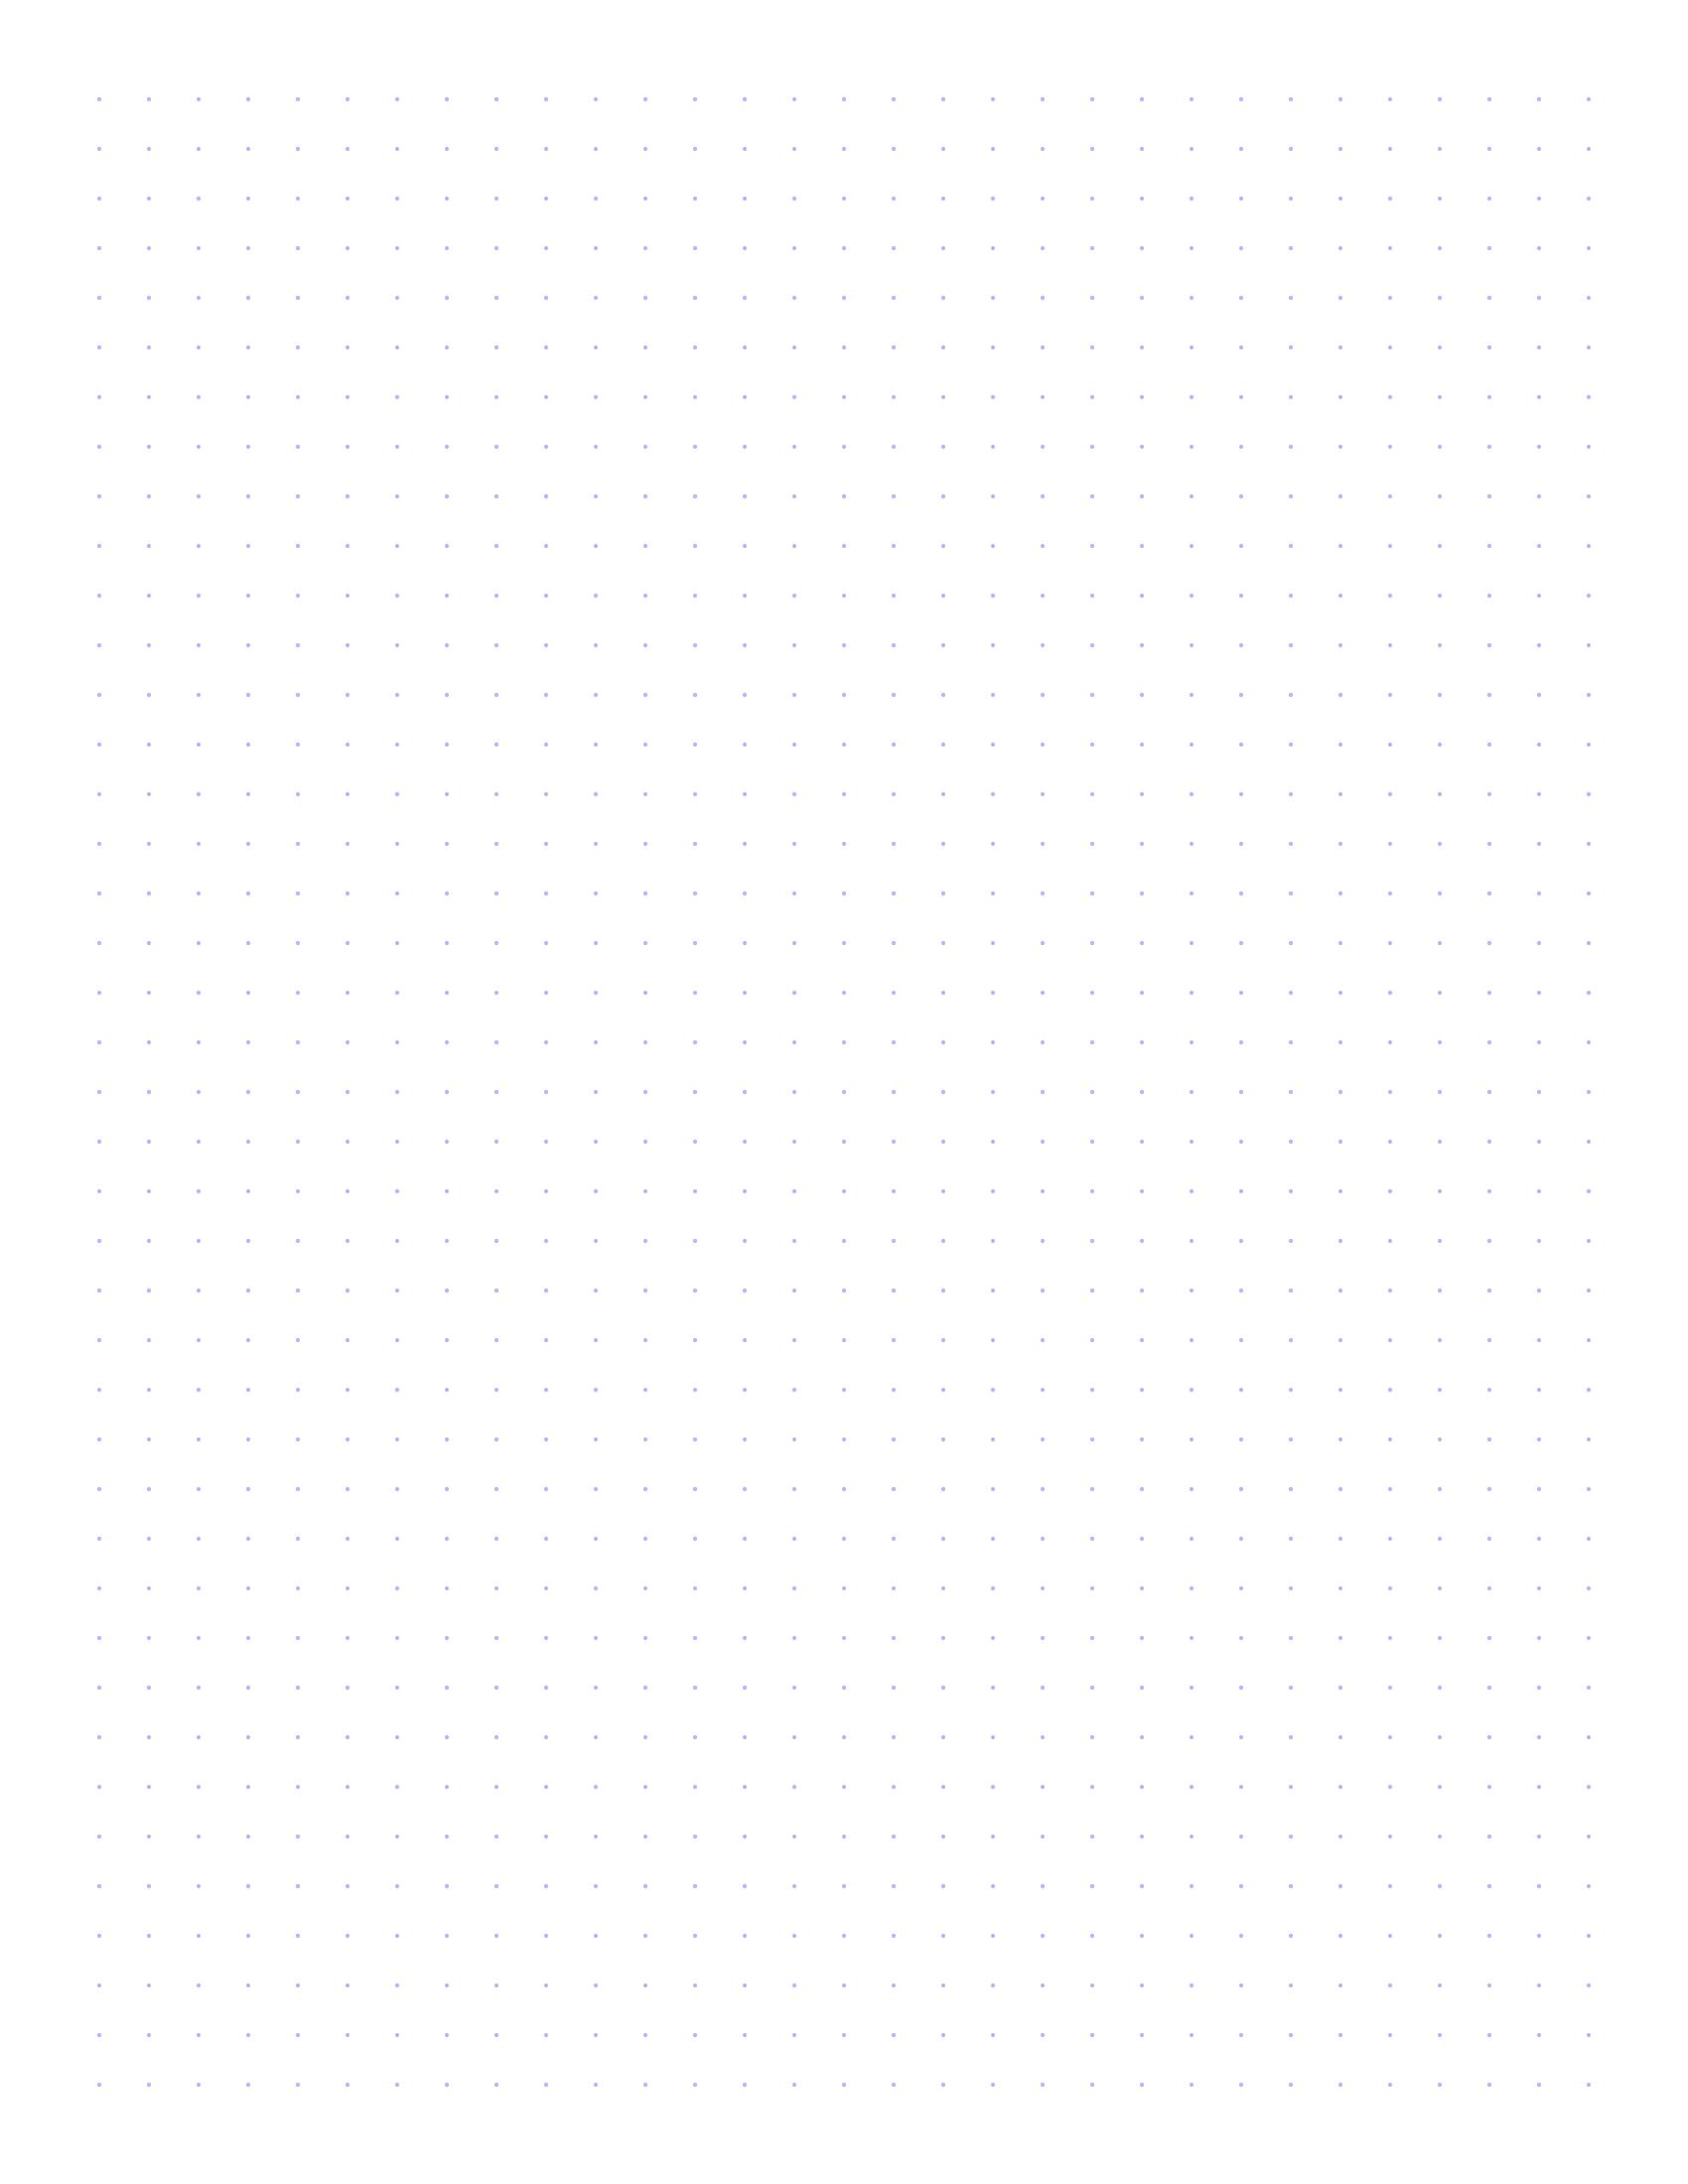 Free Online Graph Paper / Square Dots - Free Printable Square Dot Paper